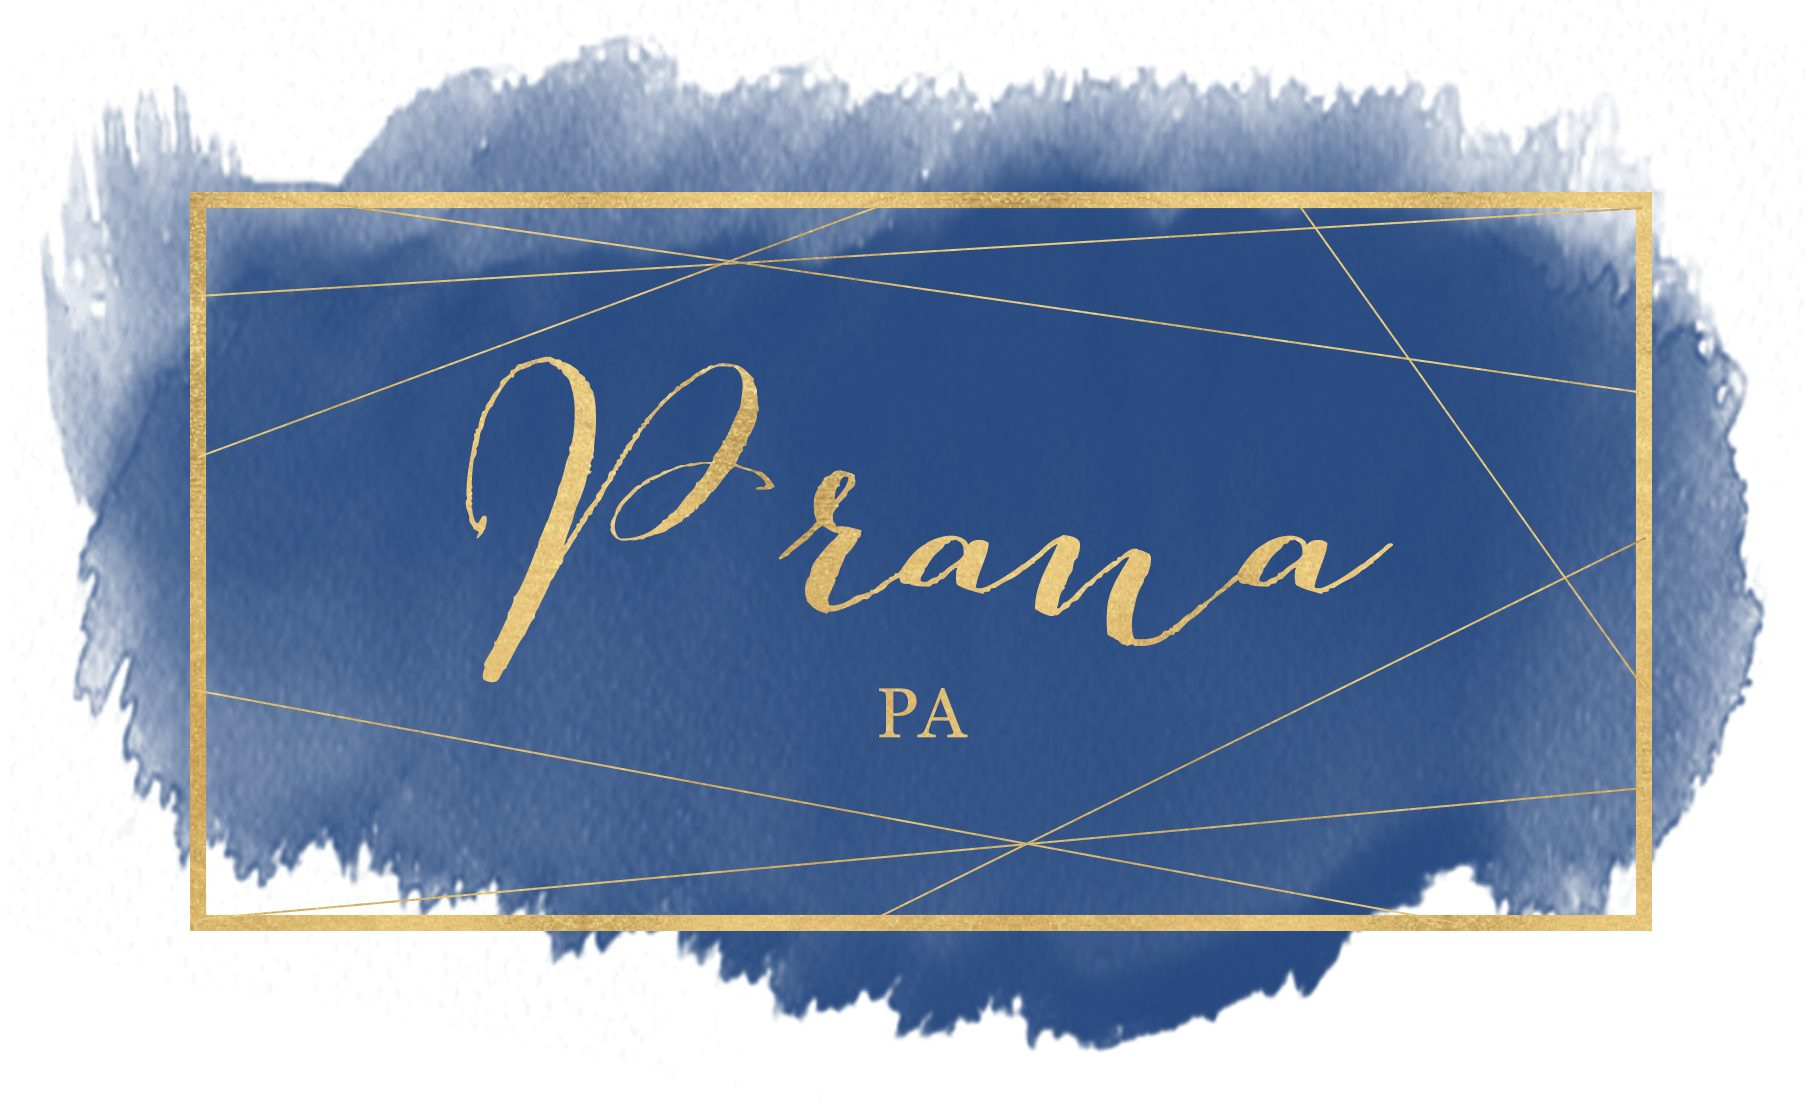 Prana PA Services